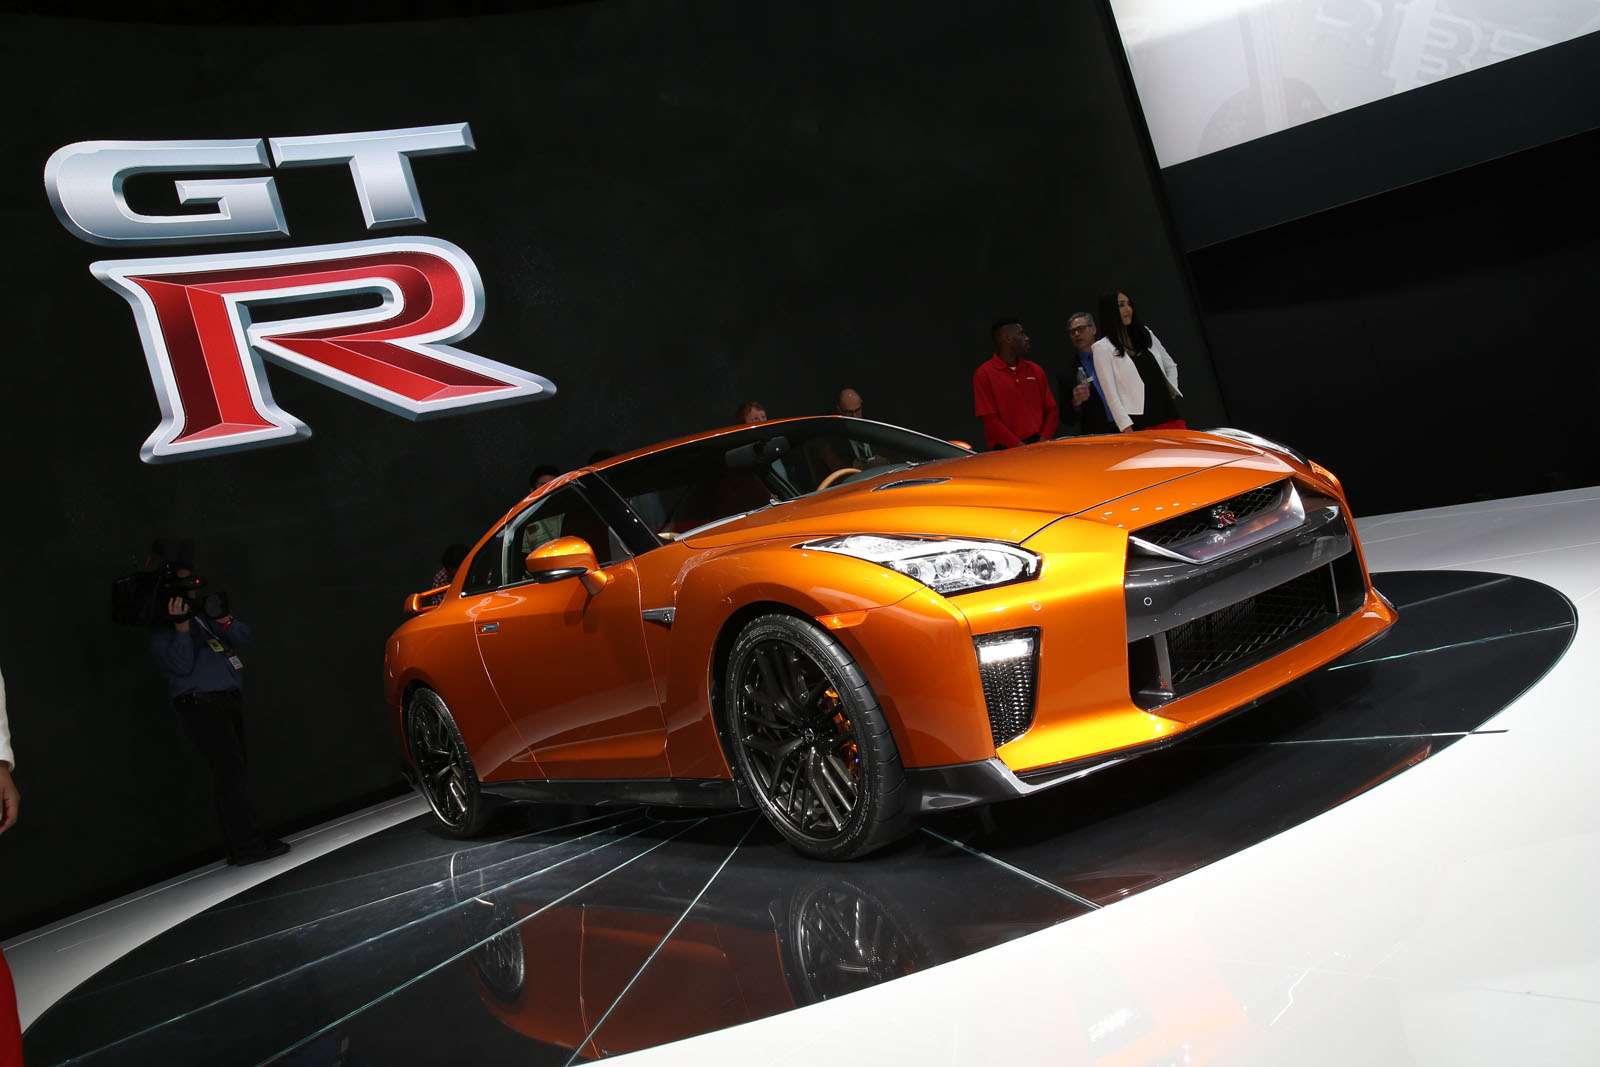 Nissan GR-R